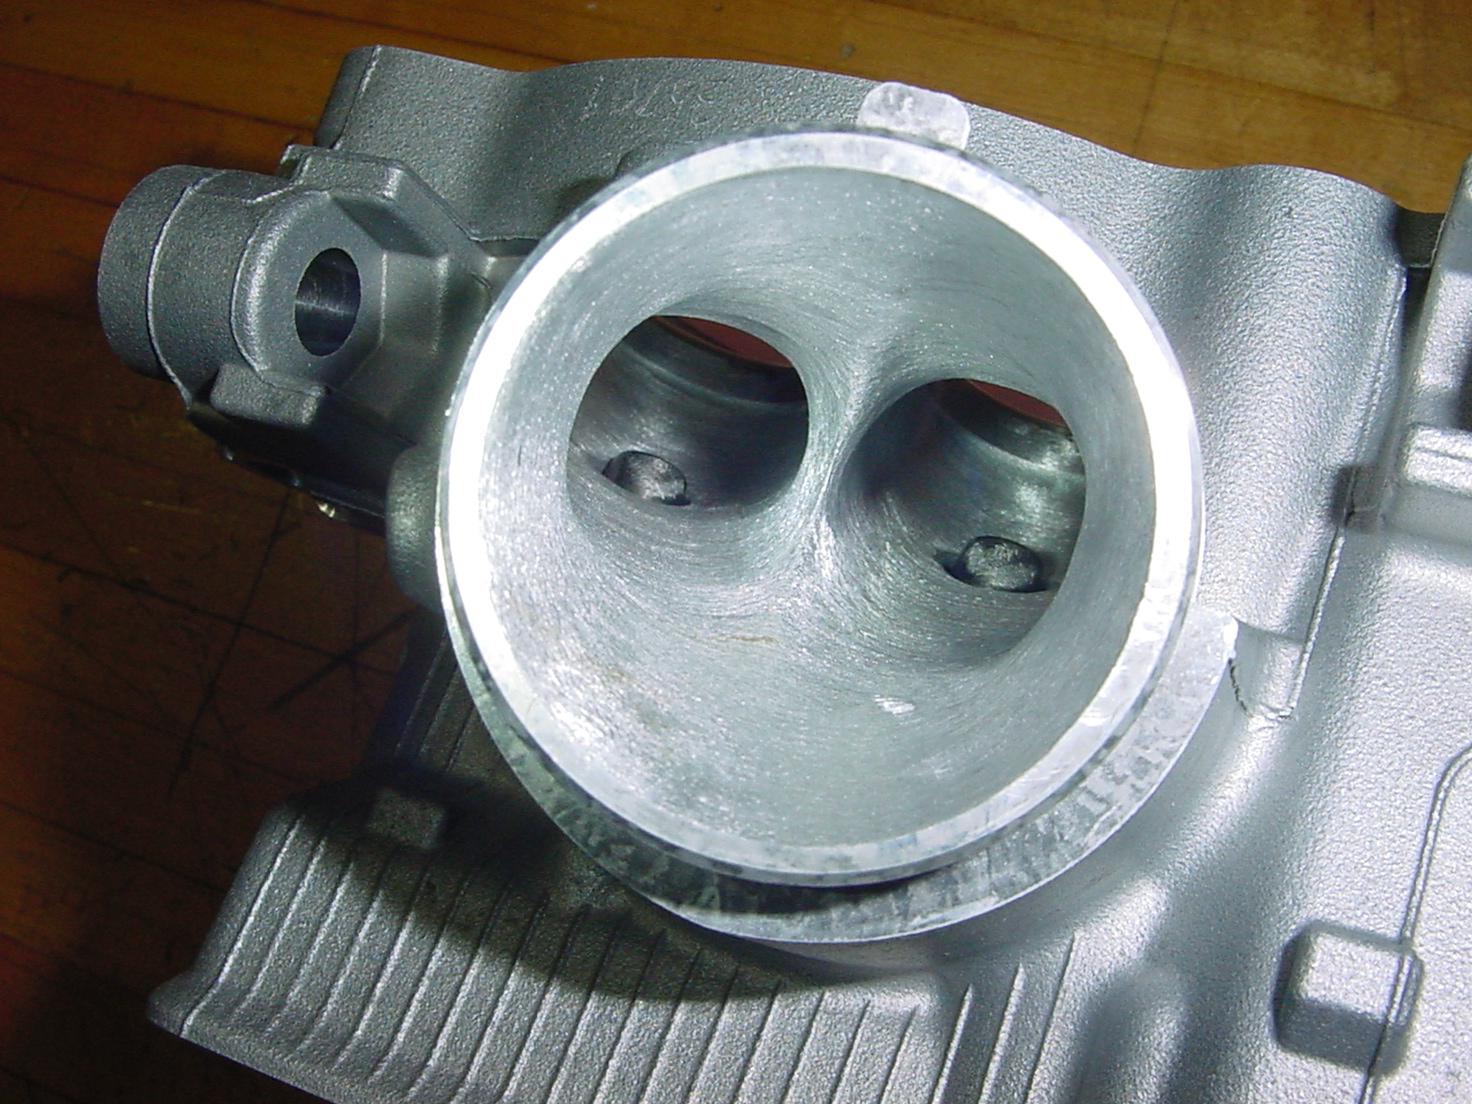 Pics of new head and mild porting - Kawasaki KFX450 Forum